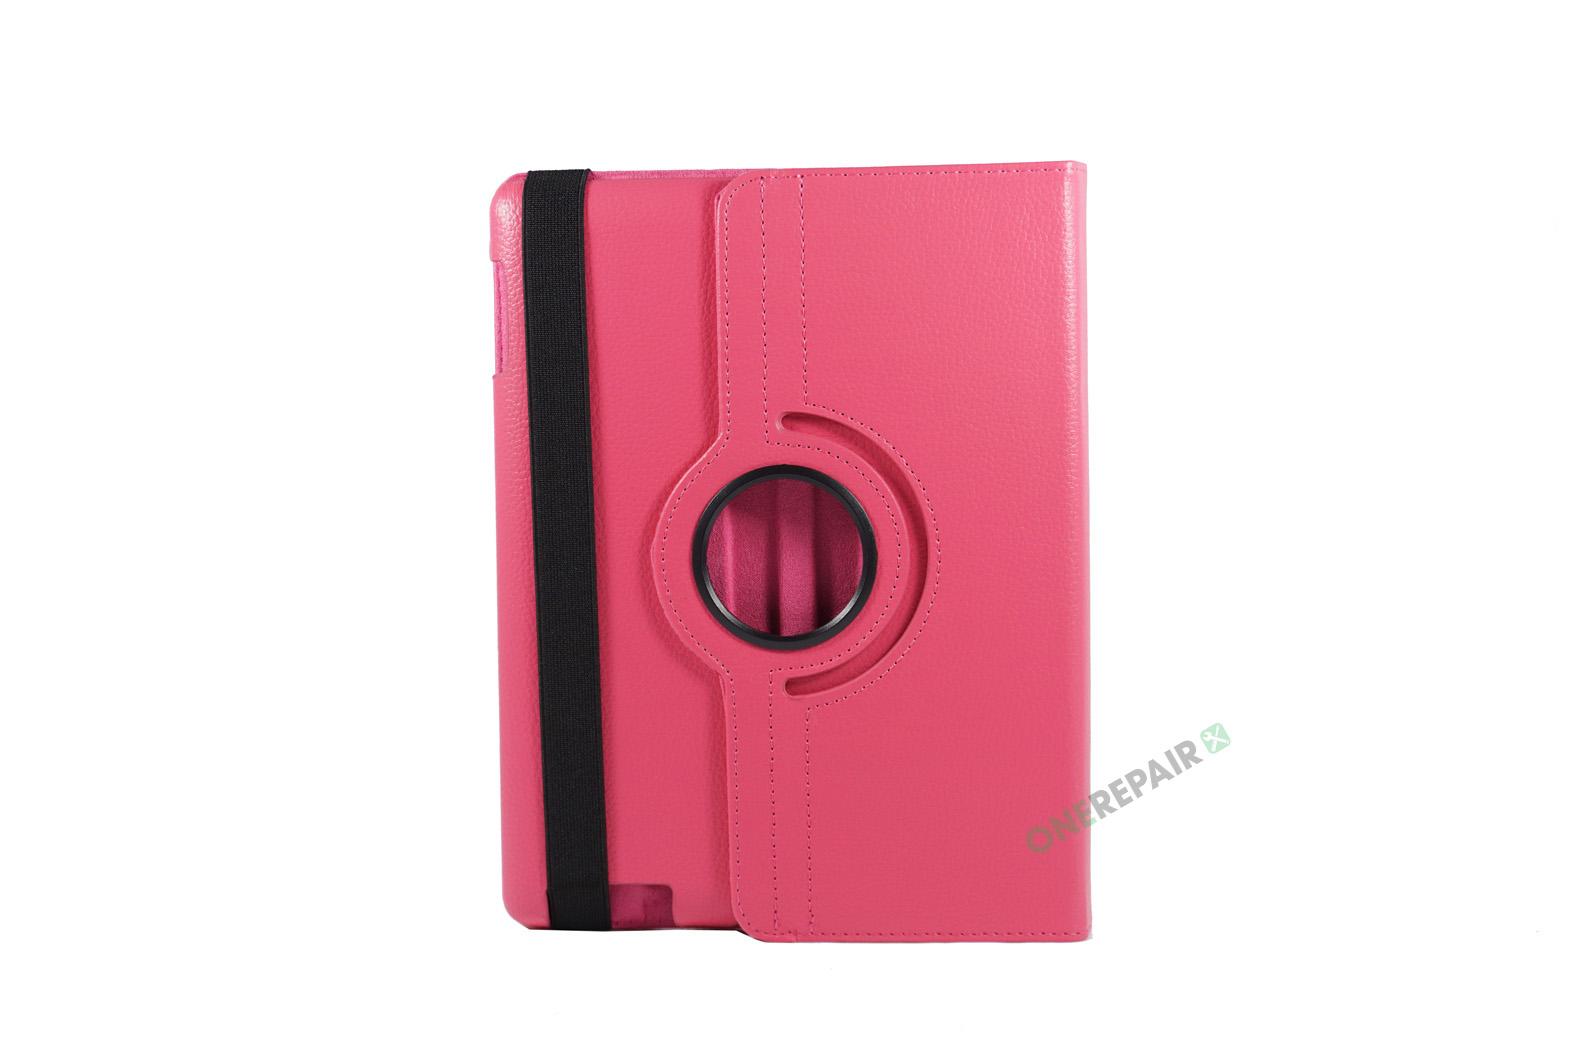 351032_iPad_2_3_4_A1395_A1396_A1430_A1403_1458_A1459_A1460_A1397_Flipcover_Classic_360_Cover_Lyseroed_Pink_Billig_Godt_Beskyttelse_OneRepair_WM_00001